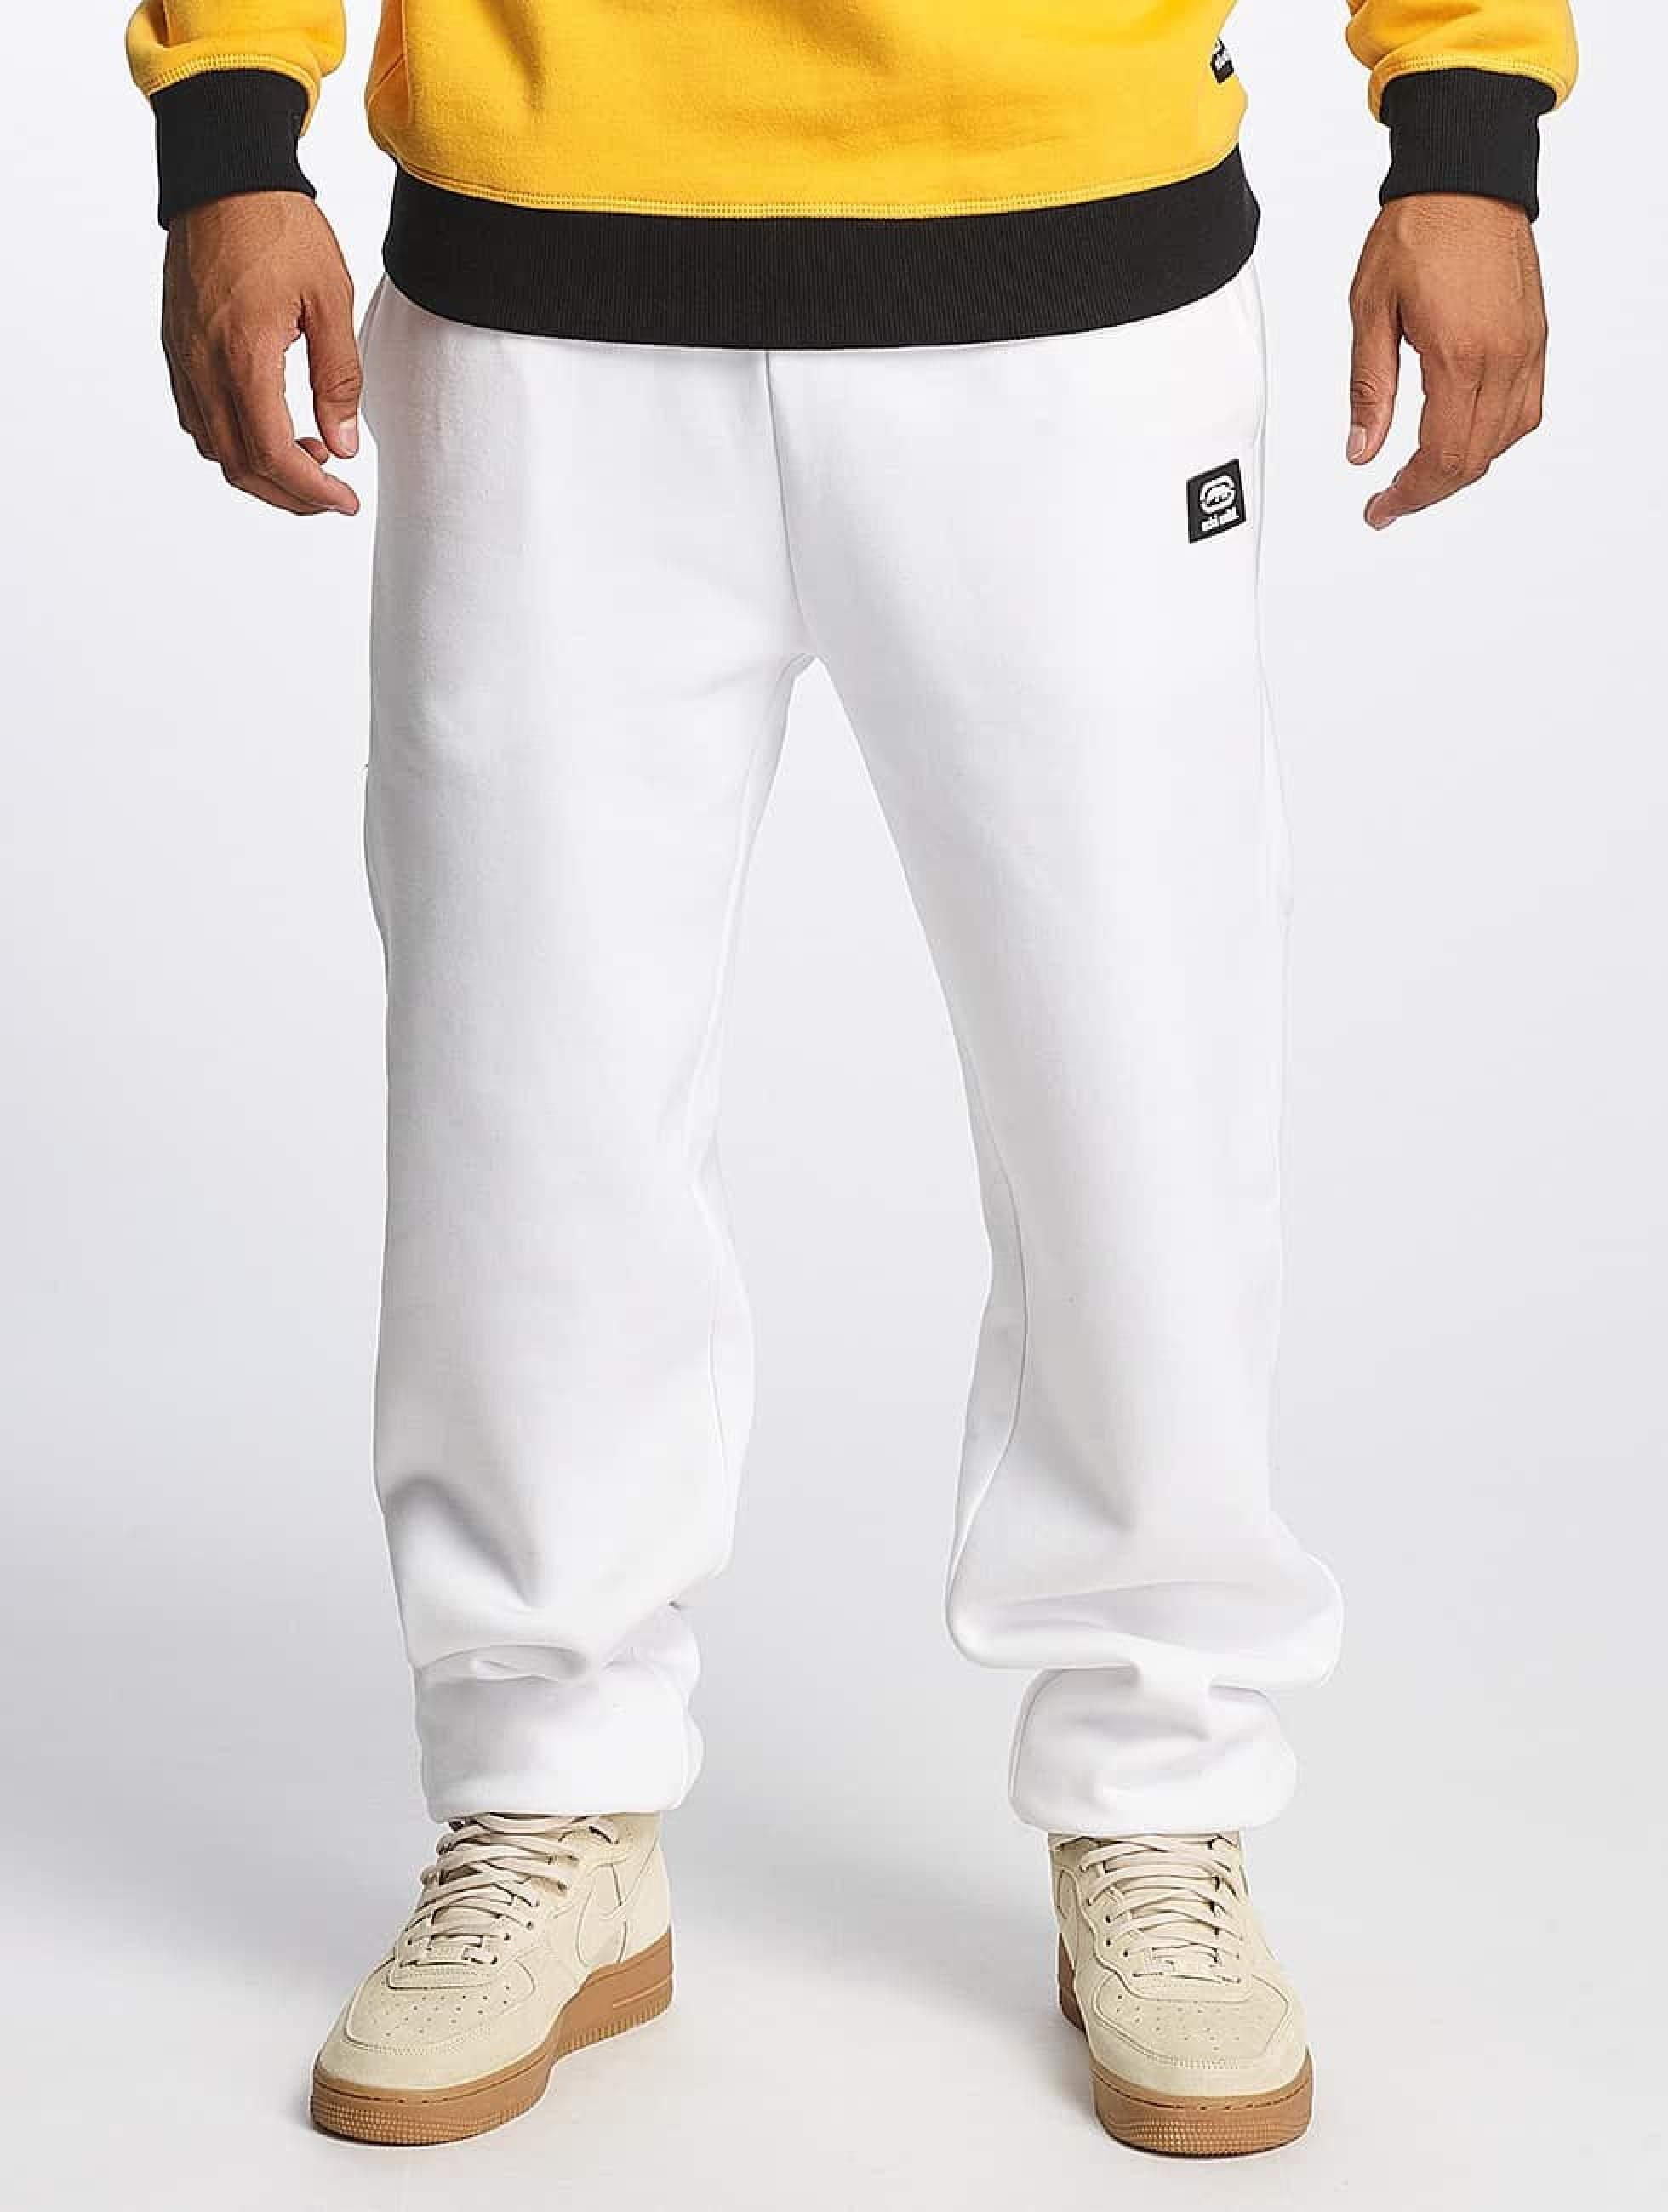 Ecko Unltd. / Sweat Pant SkeletonCoast in white 6XL